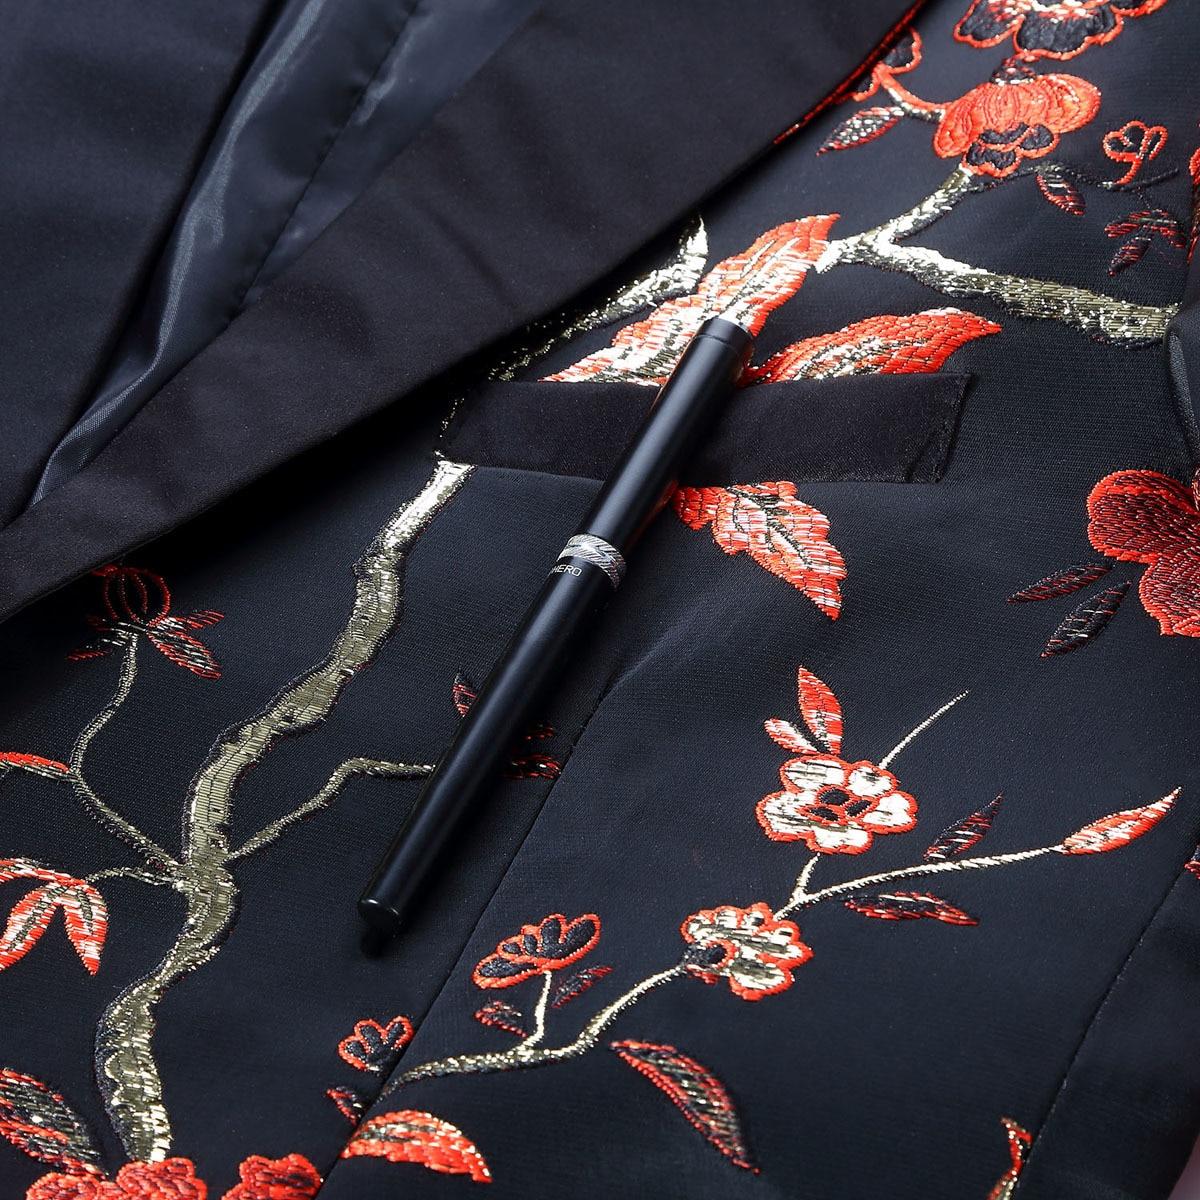 Image 3 - PYJTRL New Red Gold Blue Green Brocade Embroidery Floral Birds Pattern Slim Fit Blazer Designs Men Suit Jacket Stage Singer Wear-in Blazers from Men's Clothing